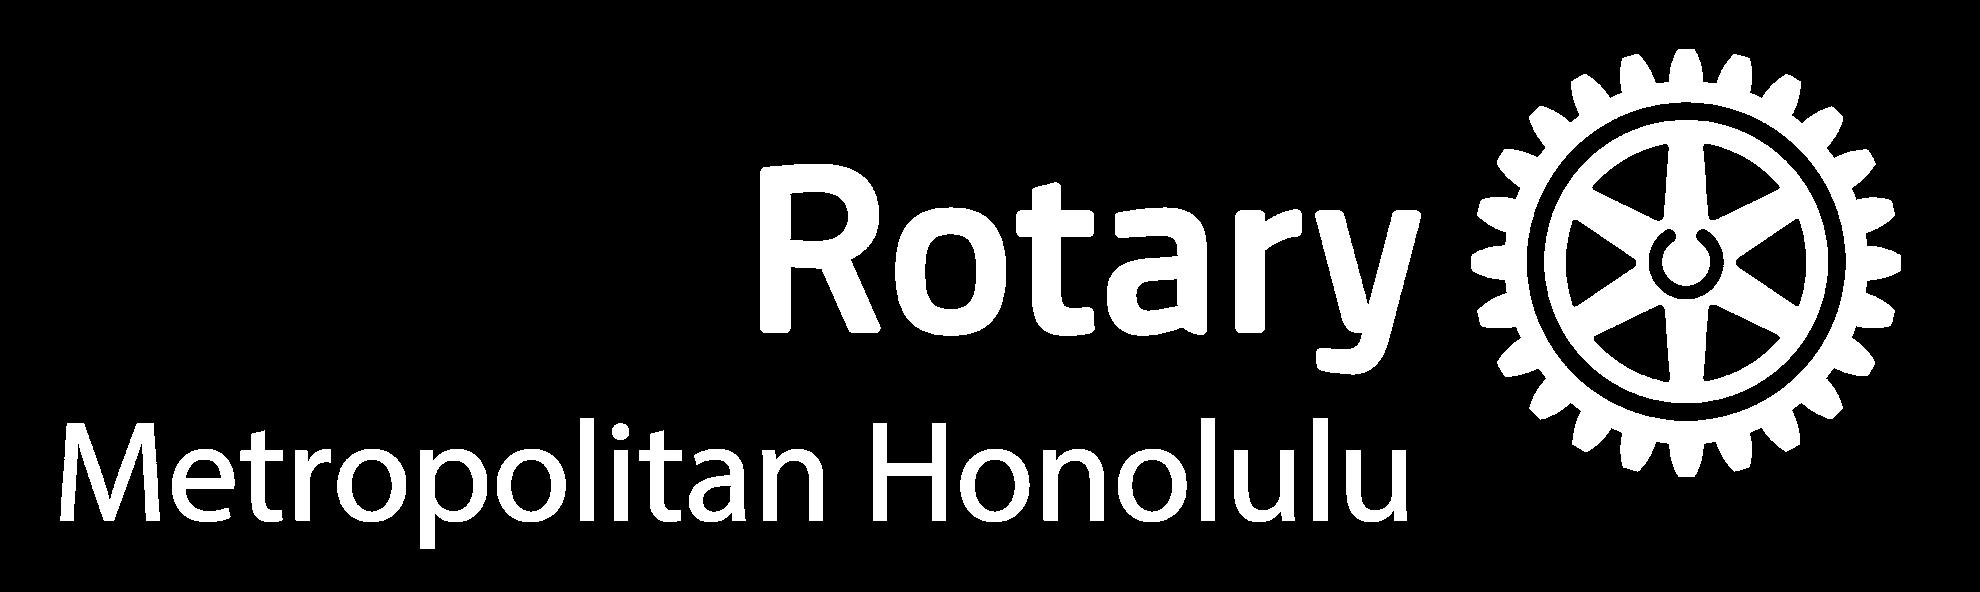 Metropolitan Honolulu logo